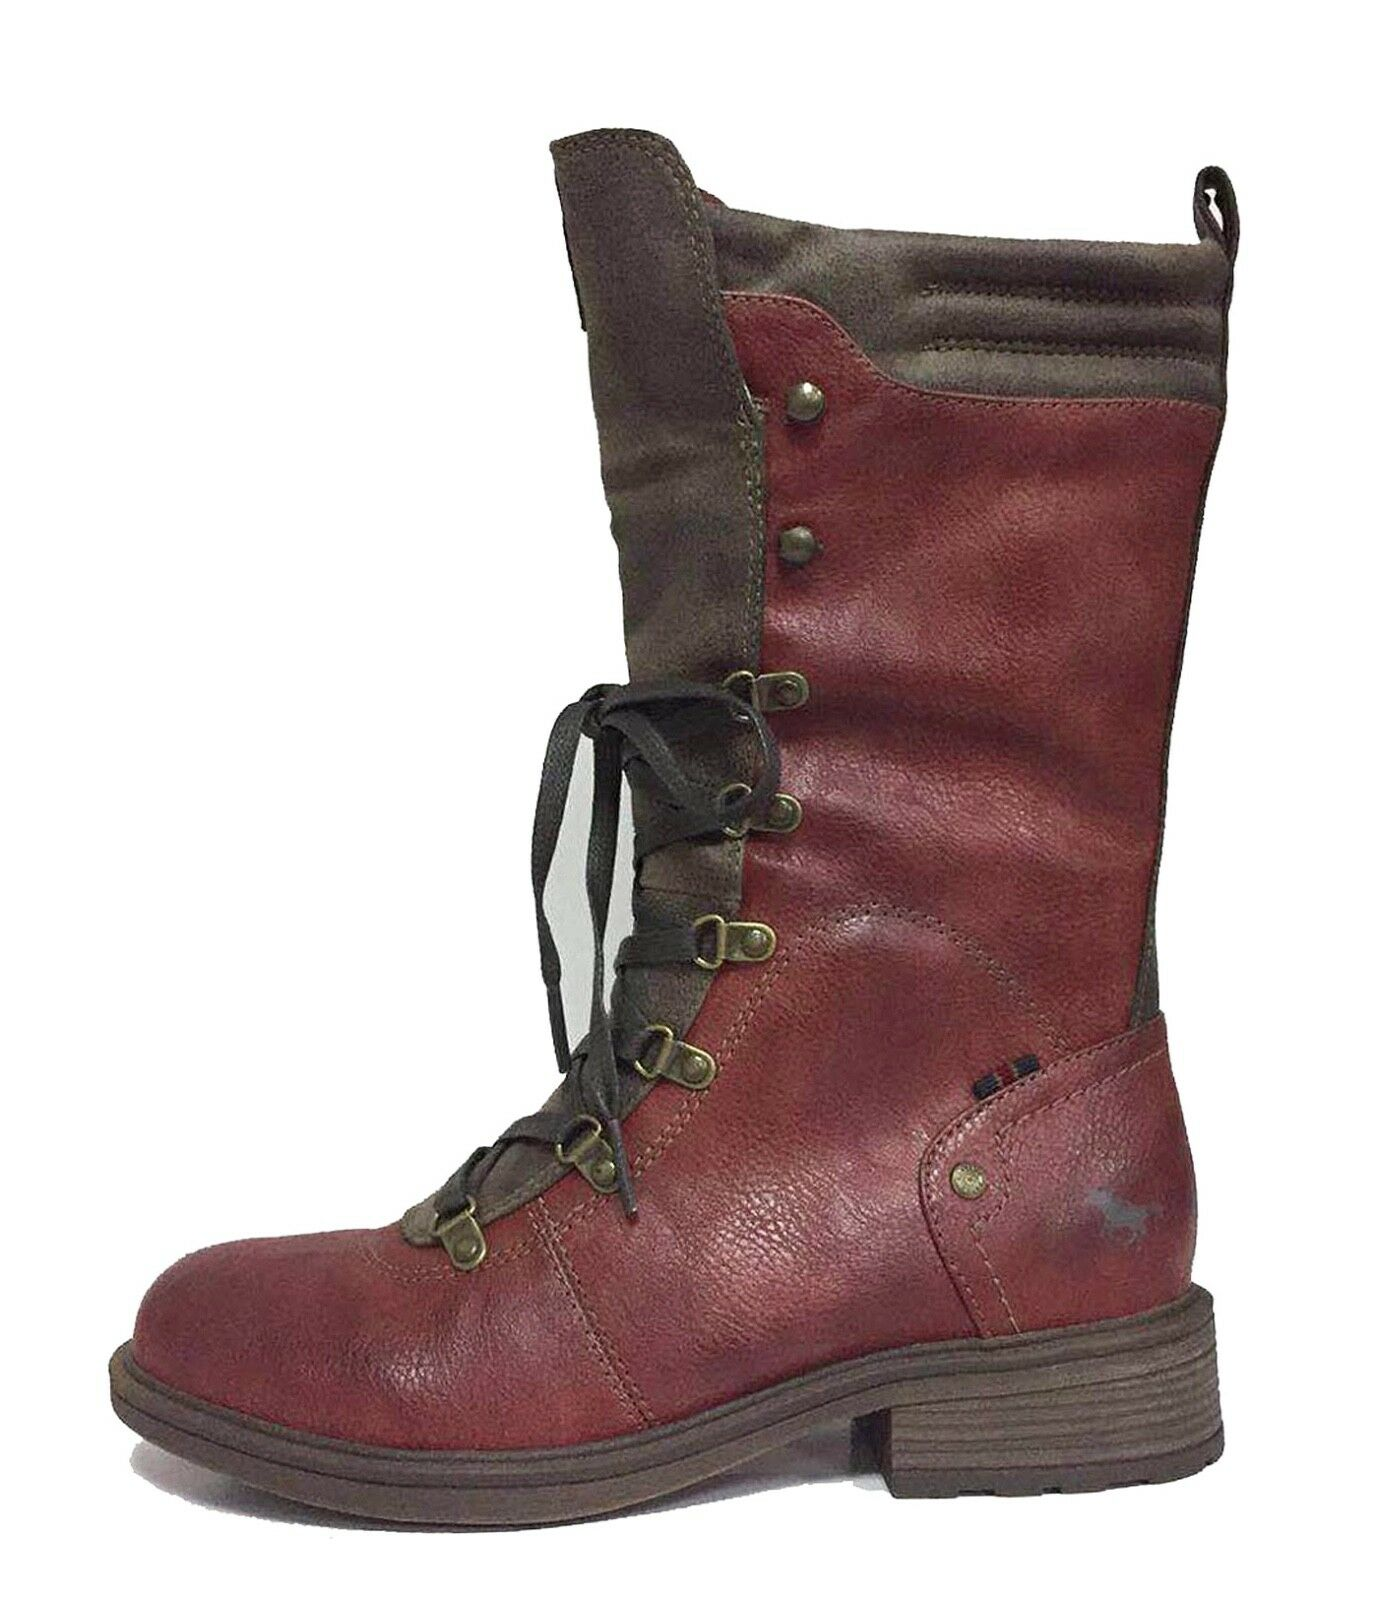 lace leather faux braun rot 1264 612 neu Mustang up heel 4 8